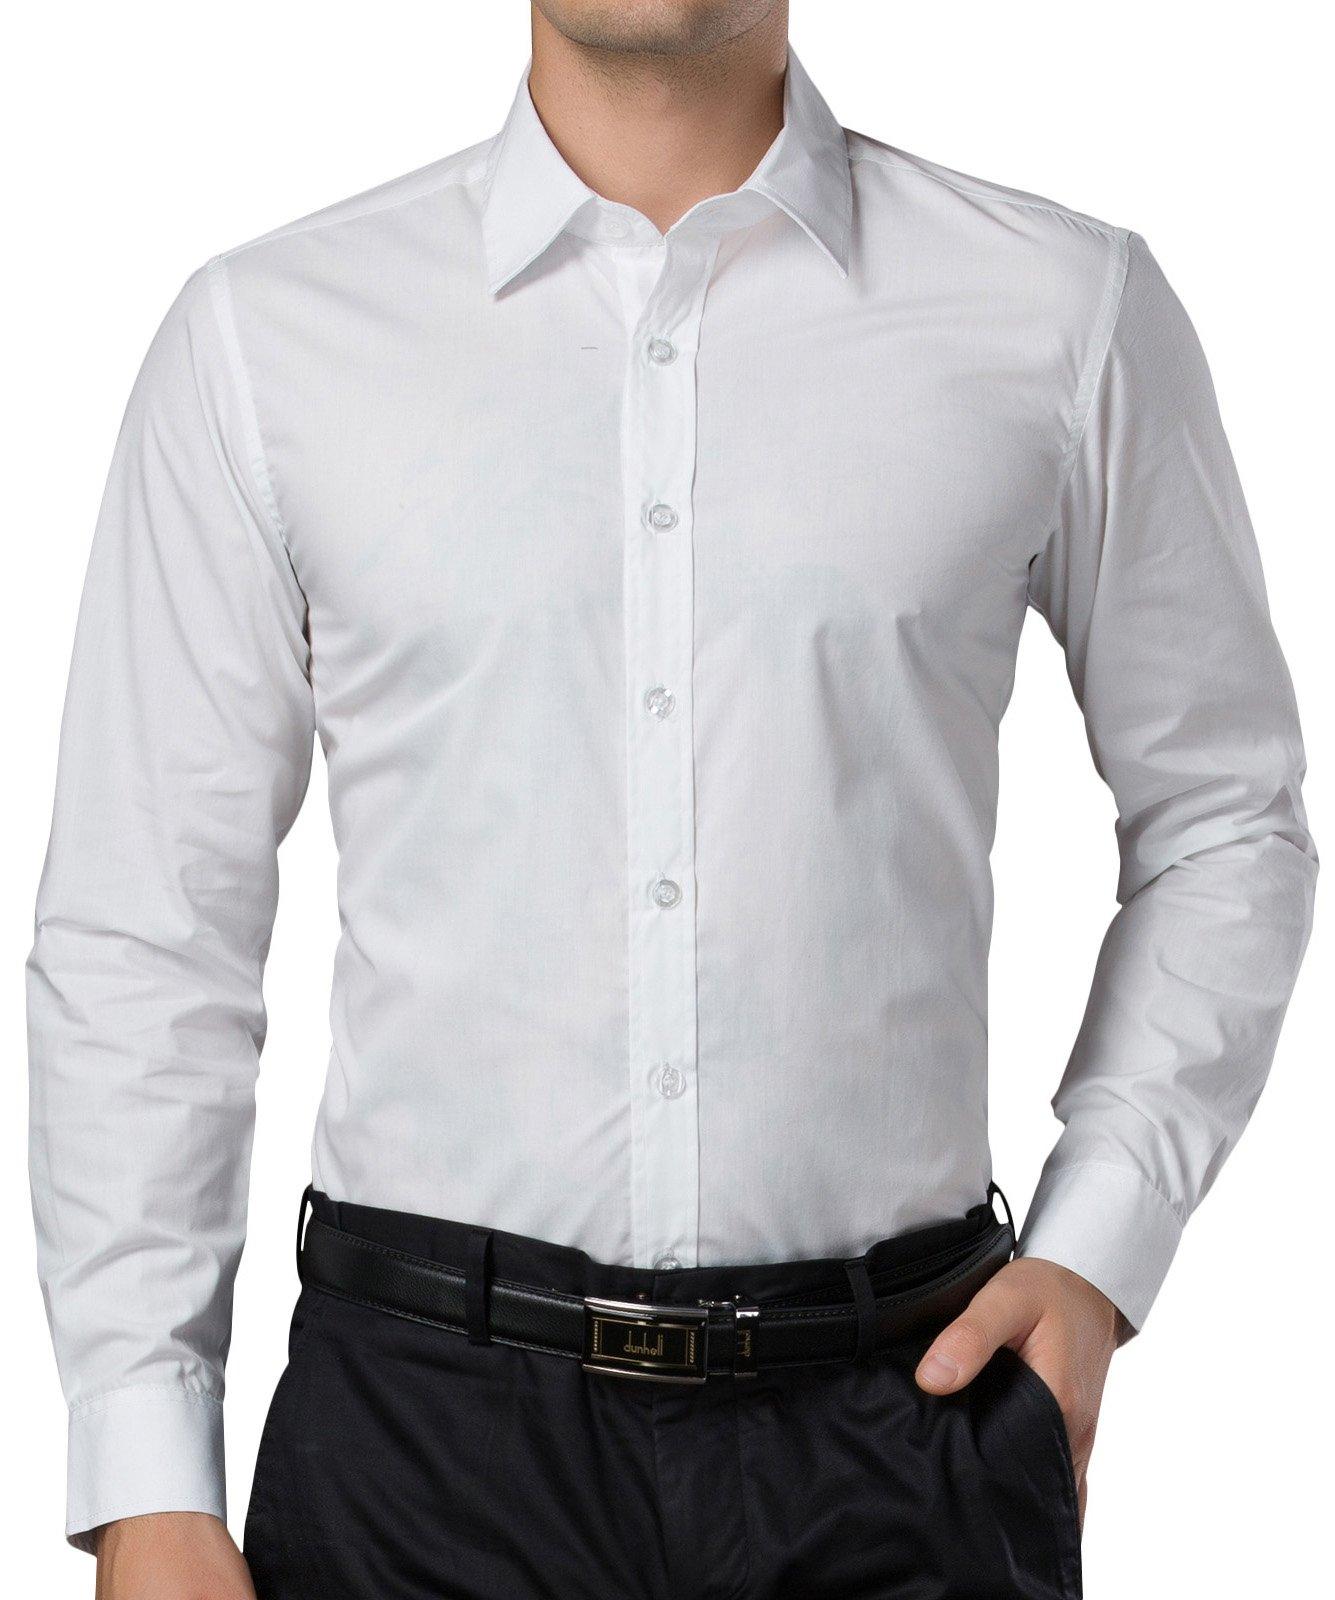 PAUL JONES White Business Casual Dress Shirts for Men Long Sleeves (L) by PAUL JONES (Image #5)